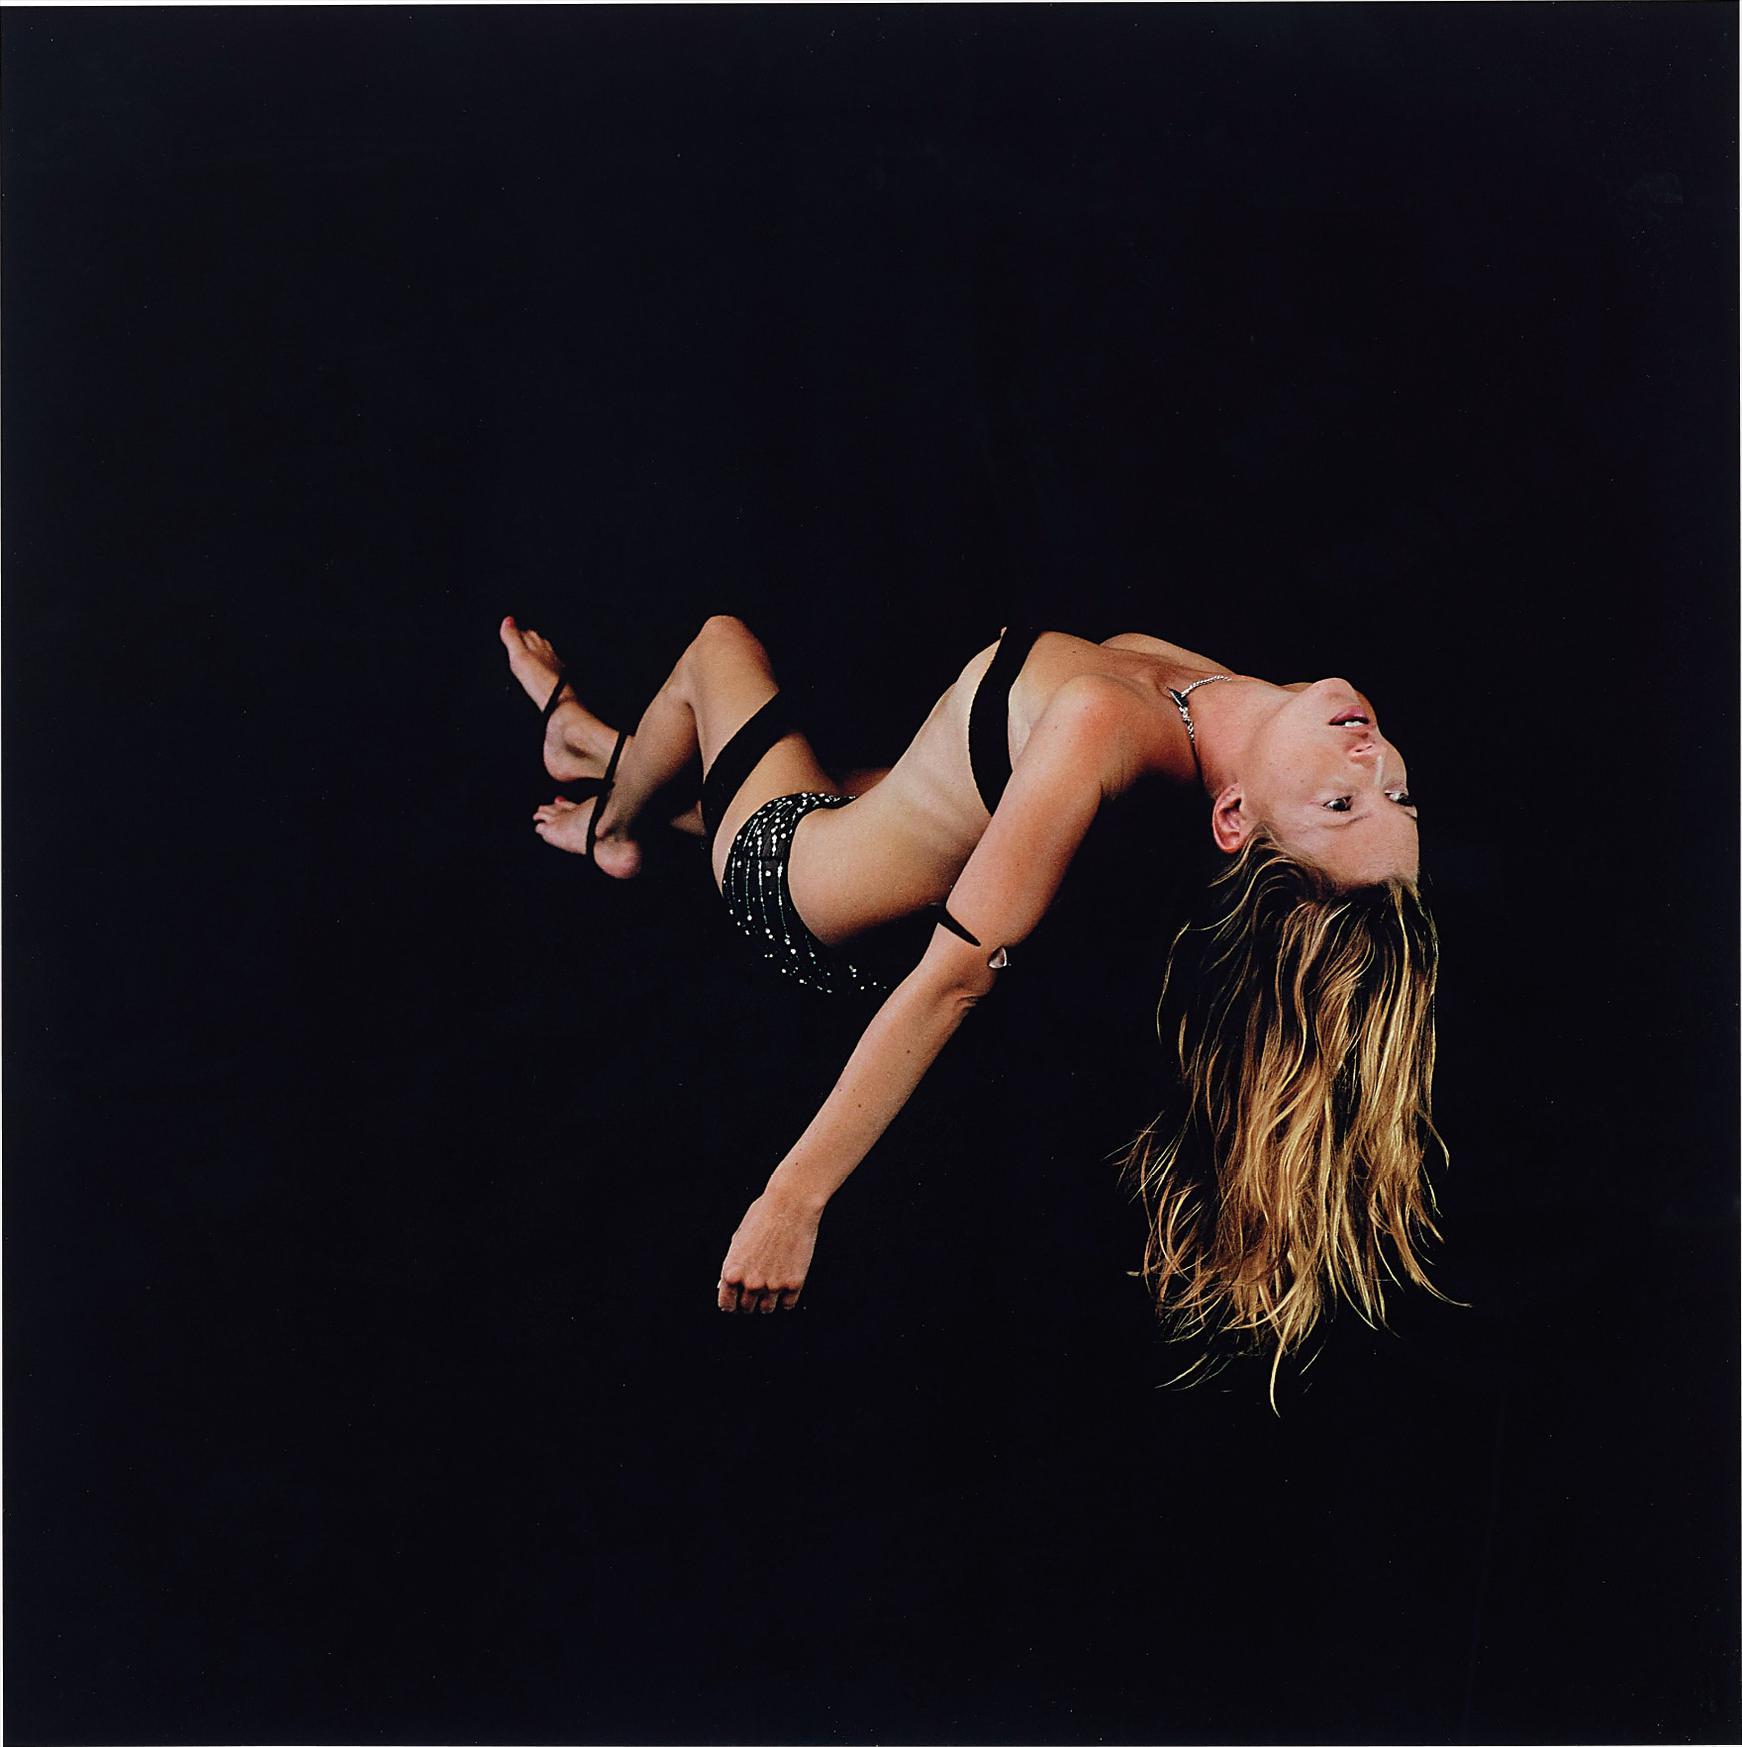 Sam Taylor-Johnson-(Untitled) Kate-2004